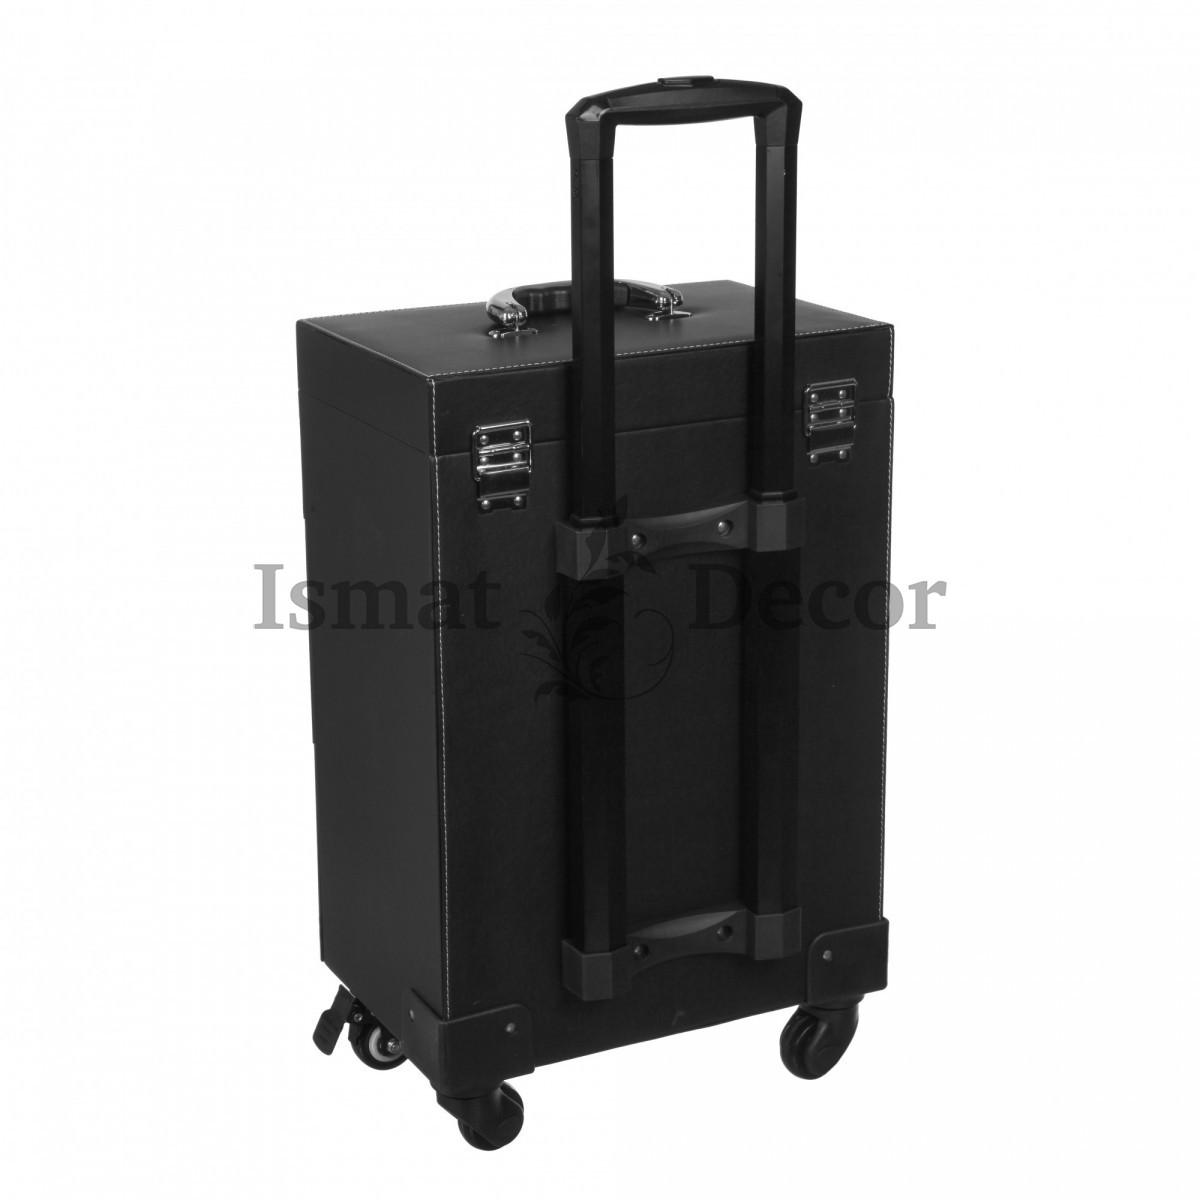 Кейс для визажиста S-8163V